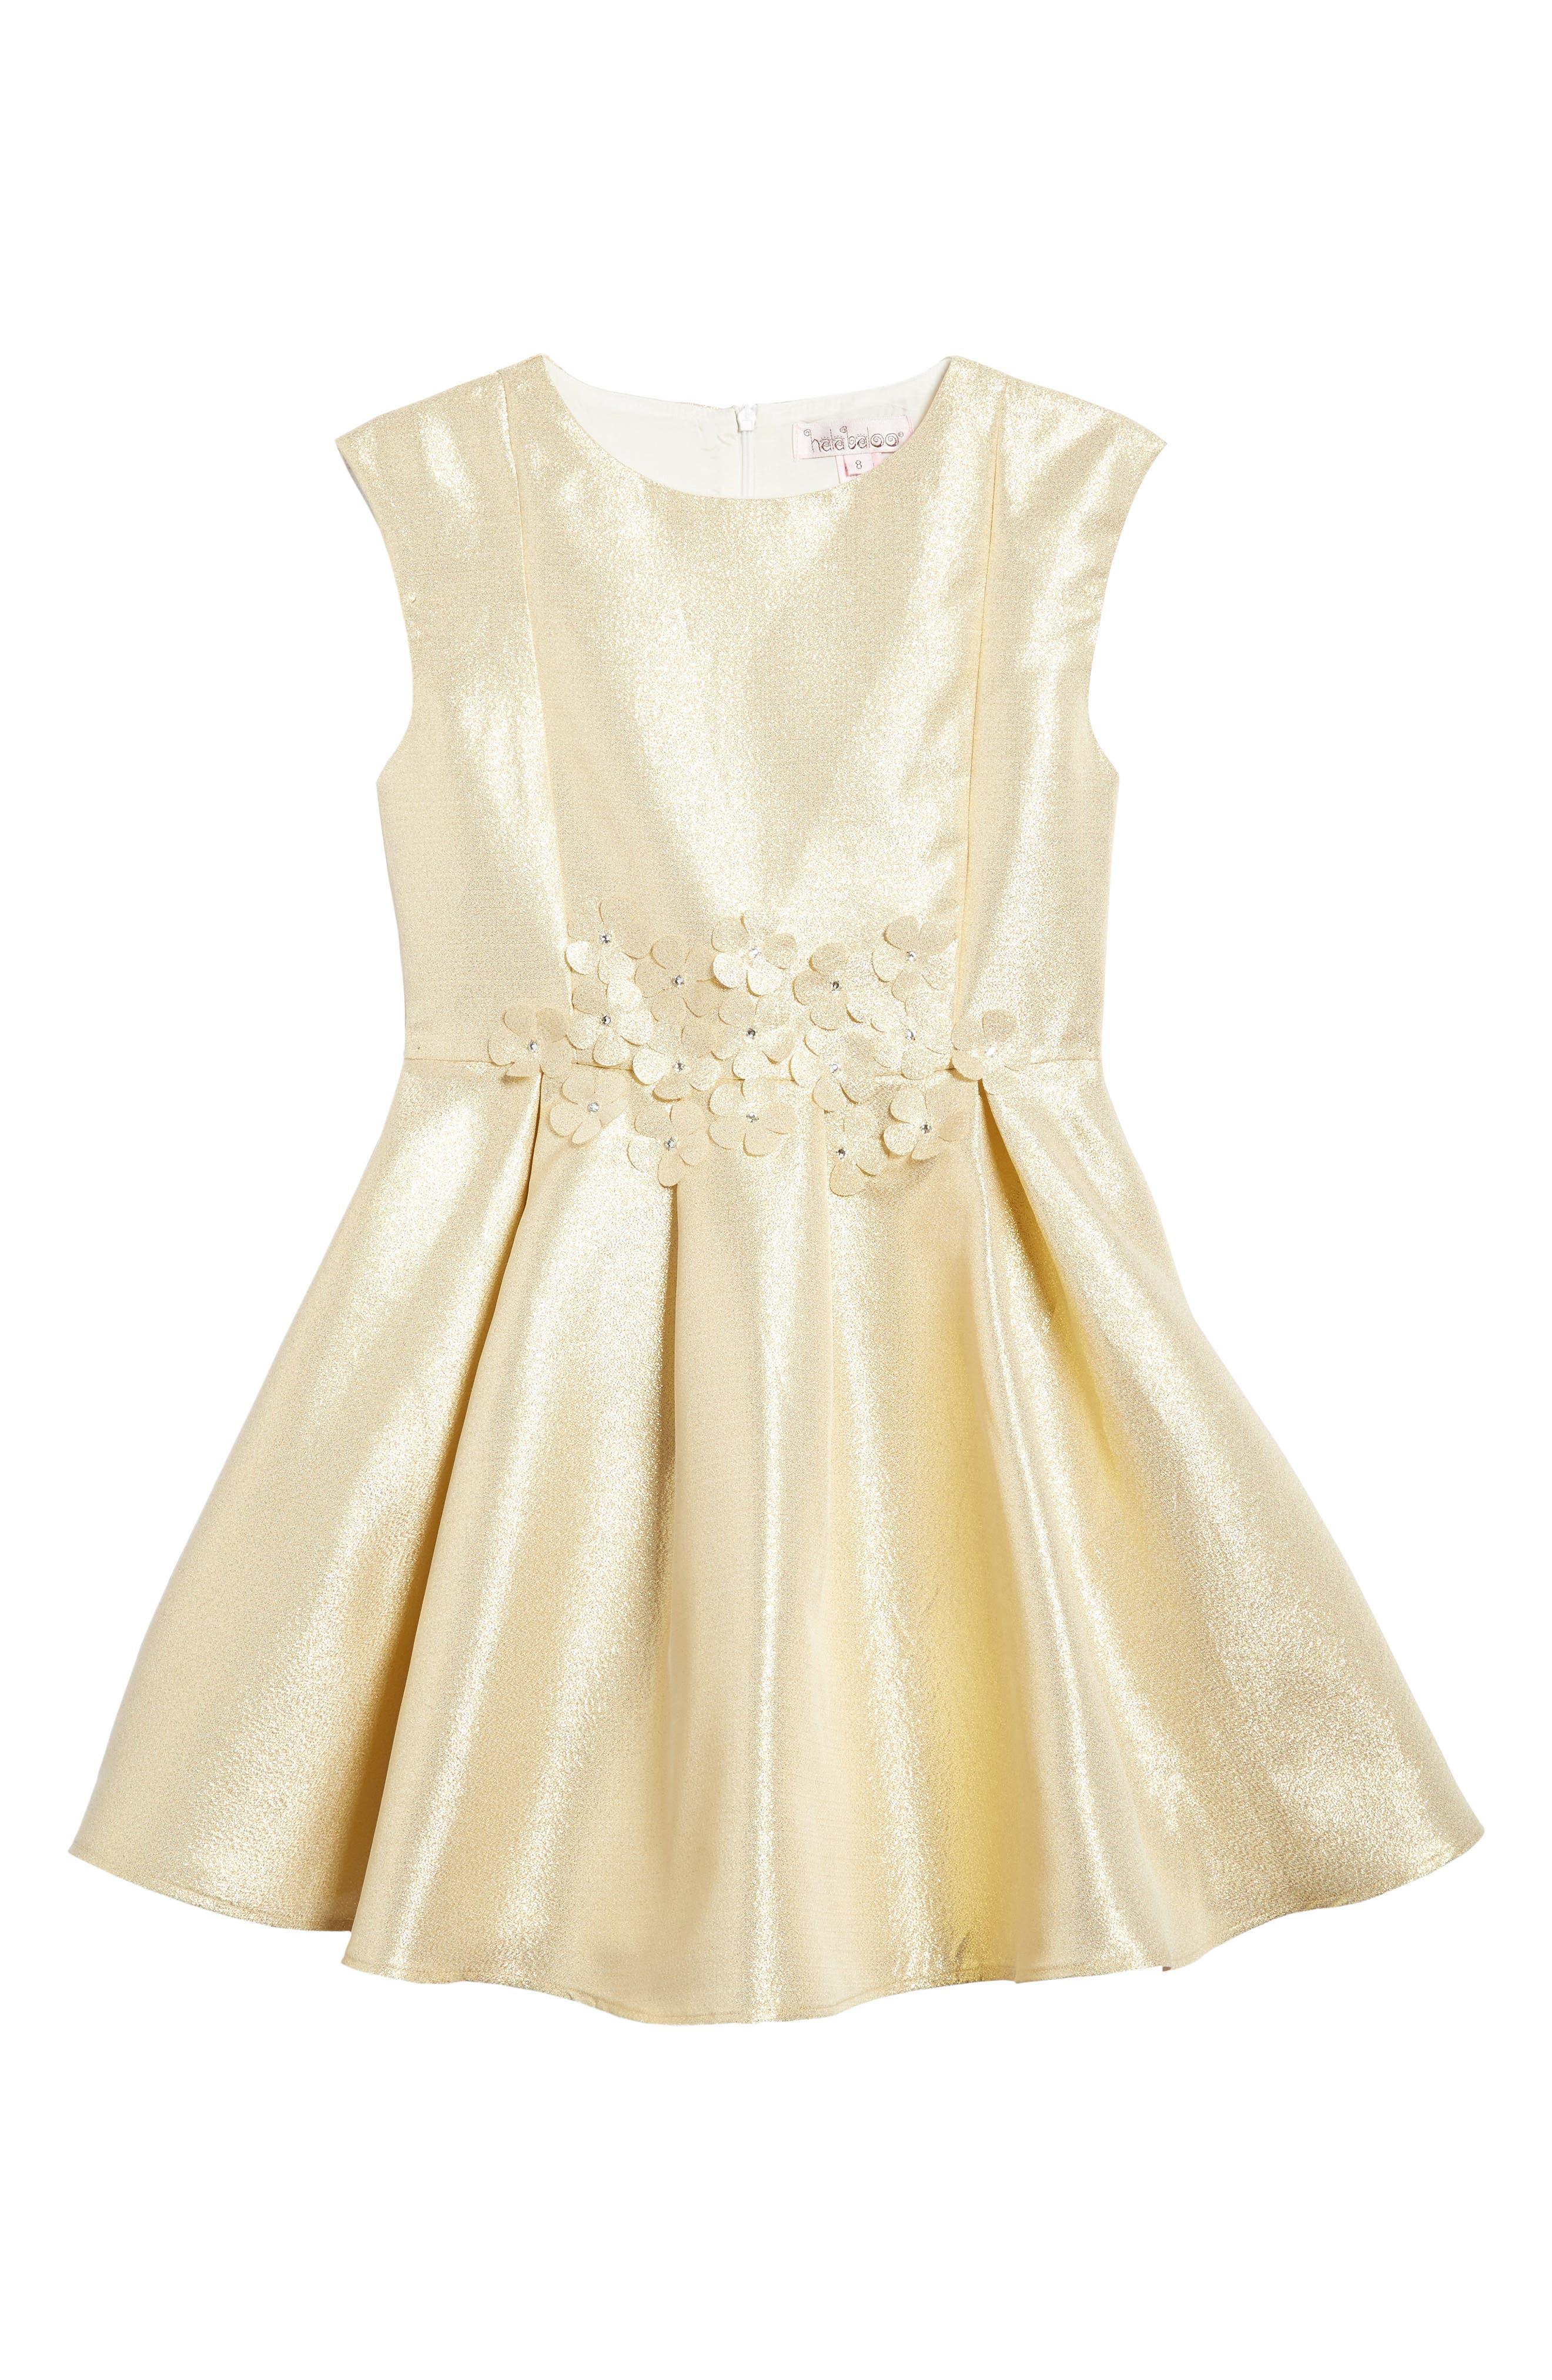 Halabaloo Crystal Bouquet Fit & Flare Dress (Toddler Girls, Little Girls & Big Girls)